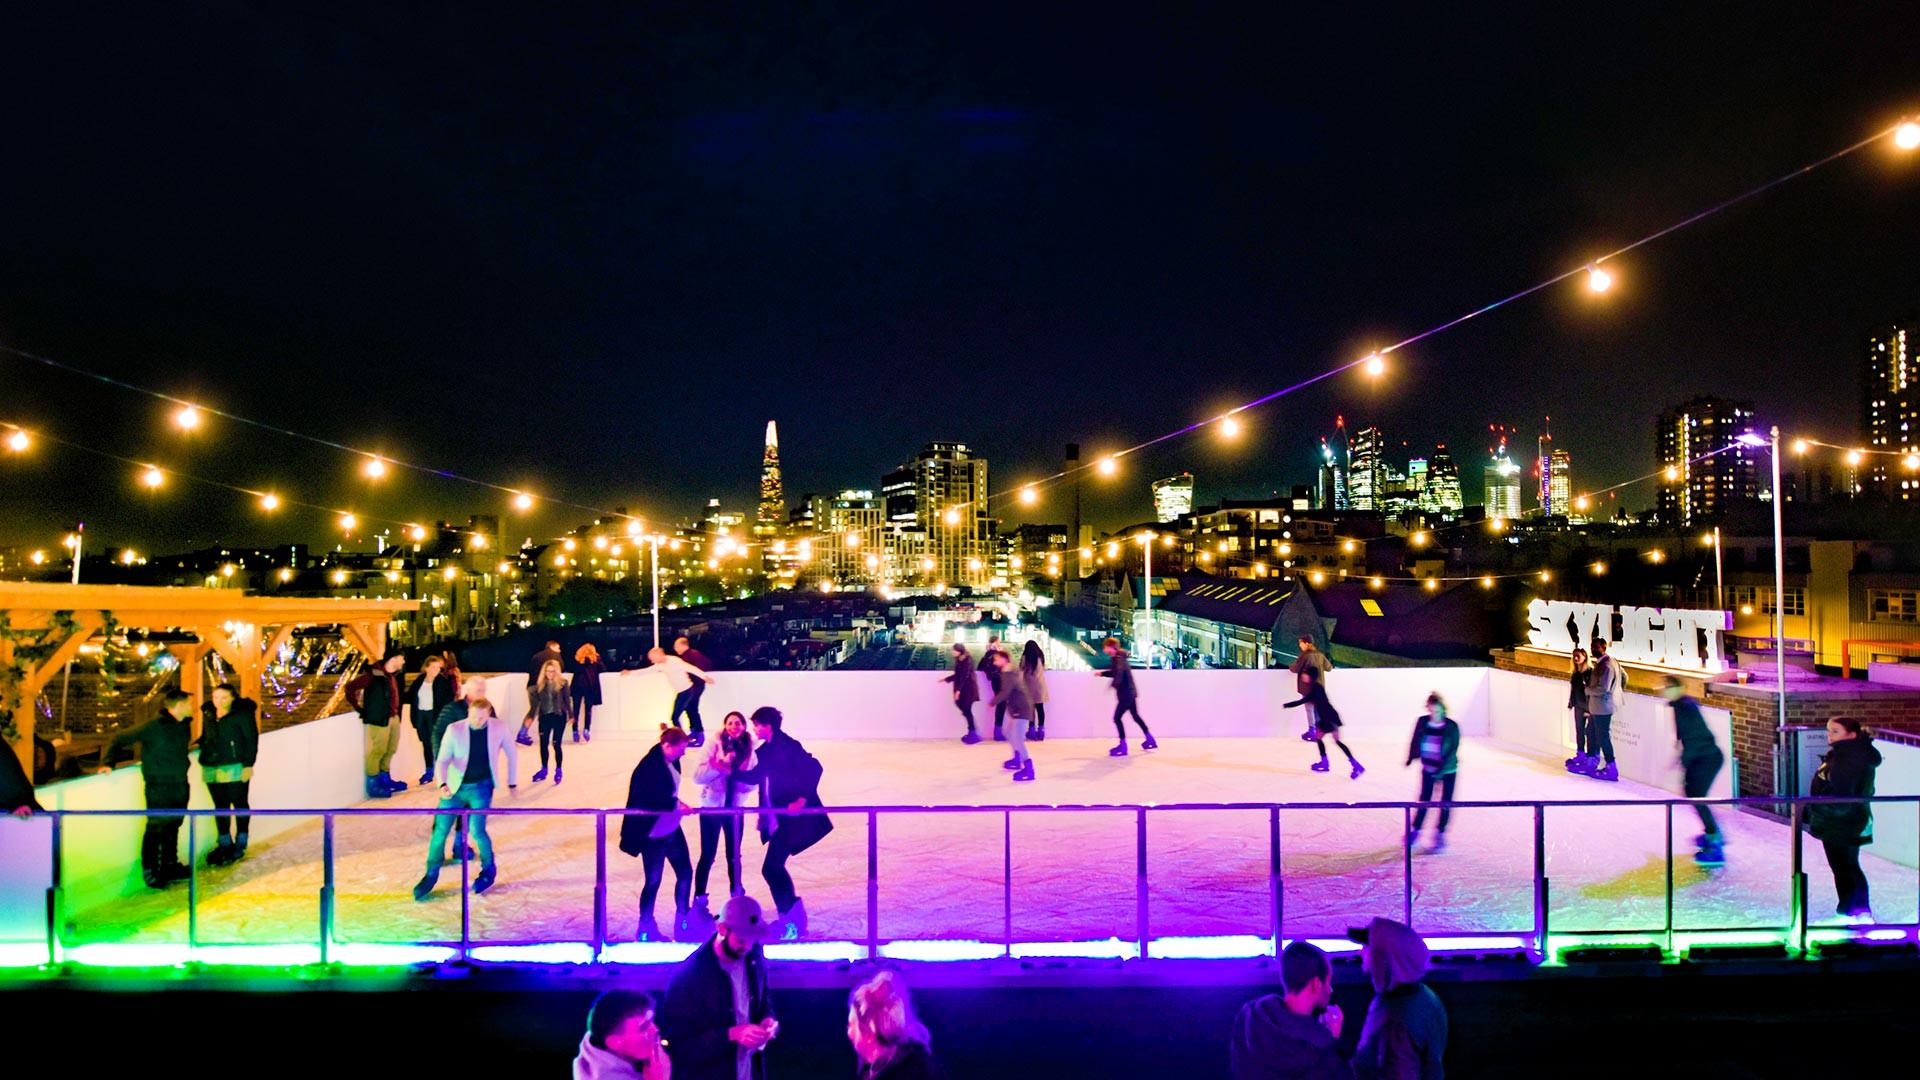 Skylight ice skating rink